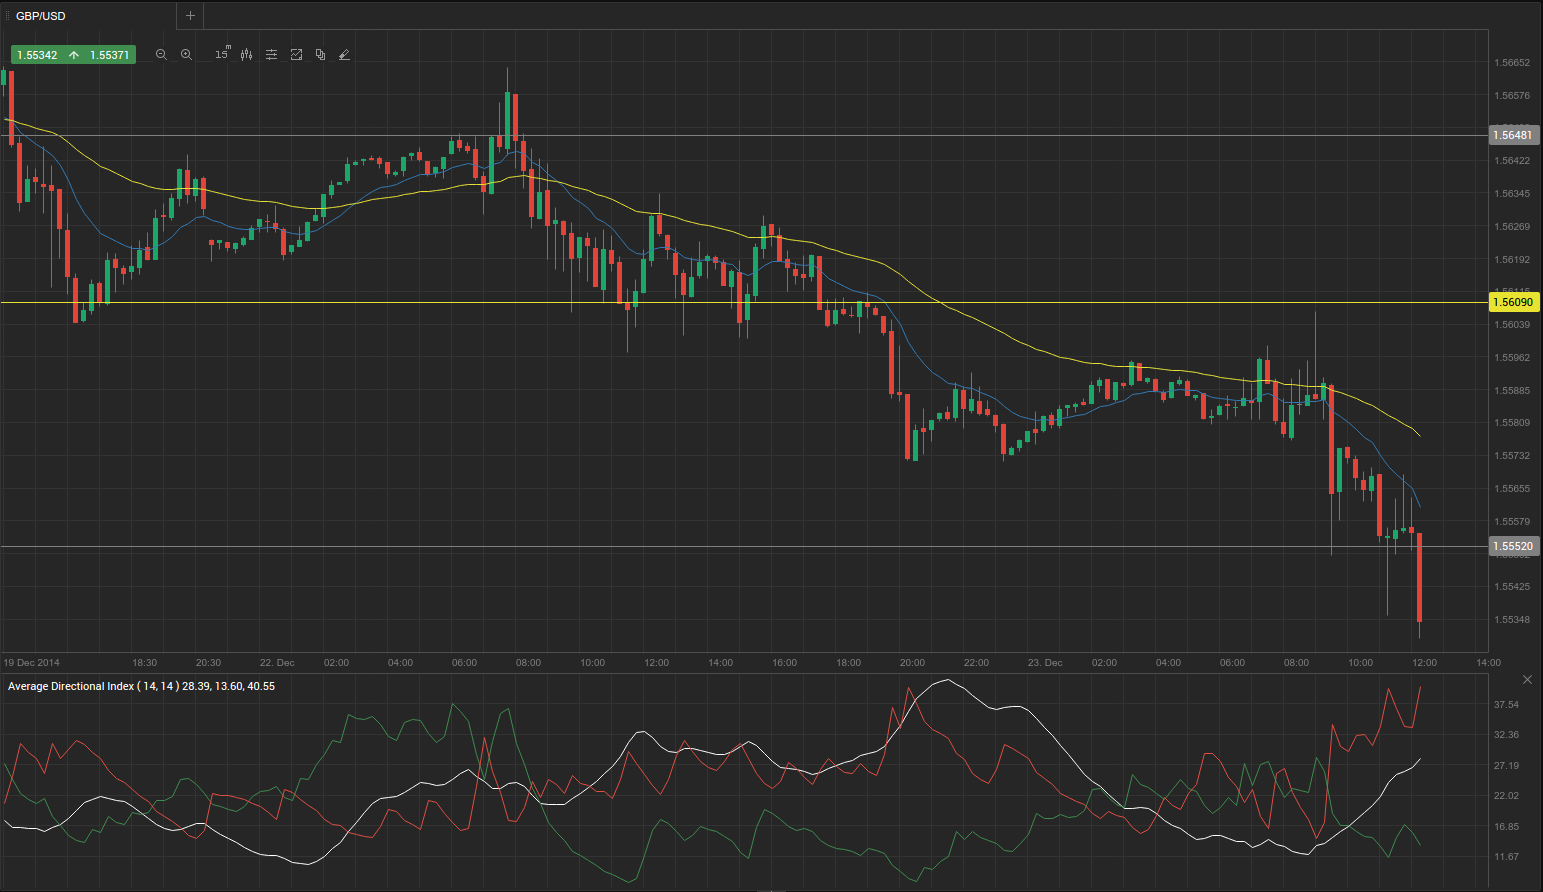 Gbp forex market